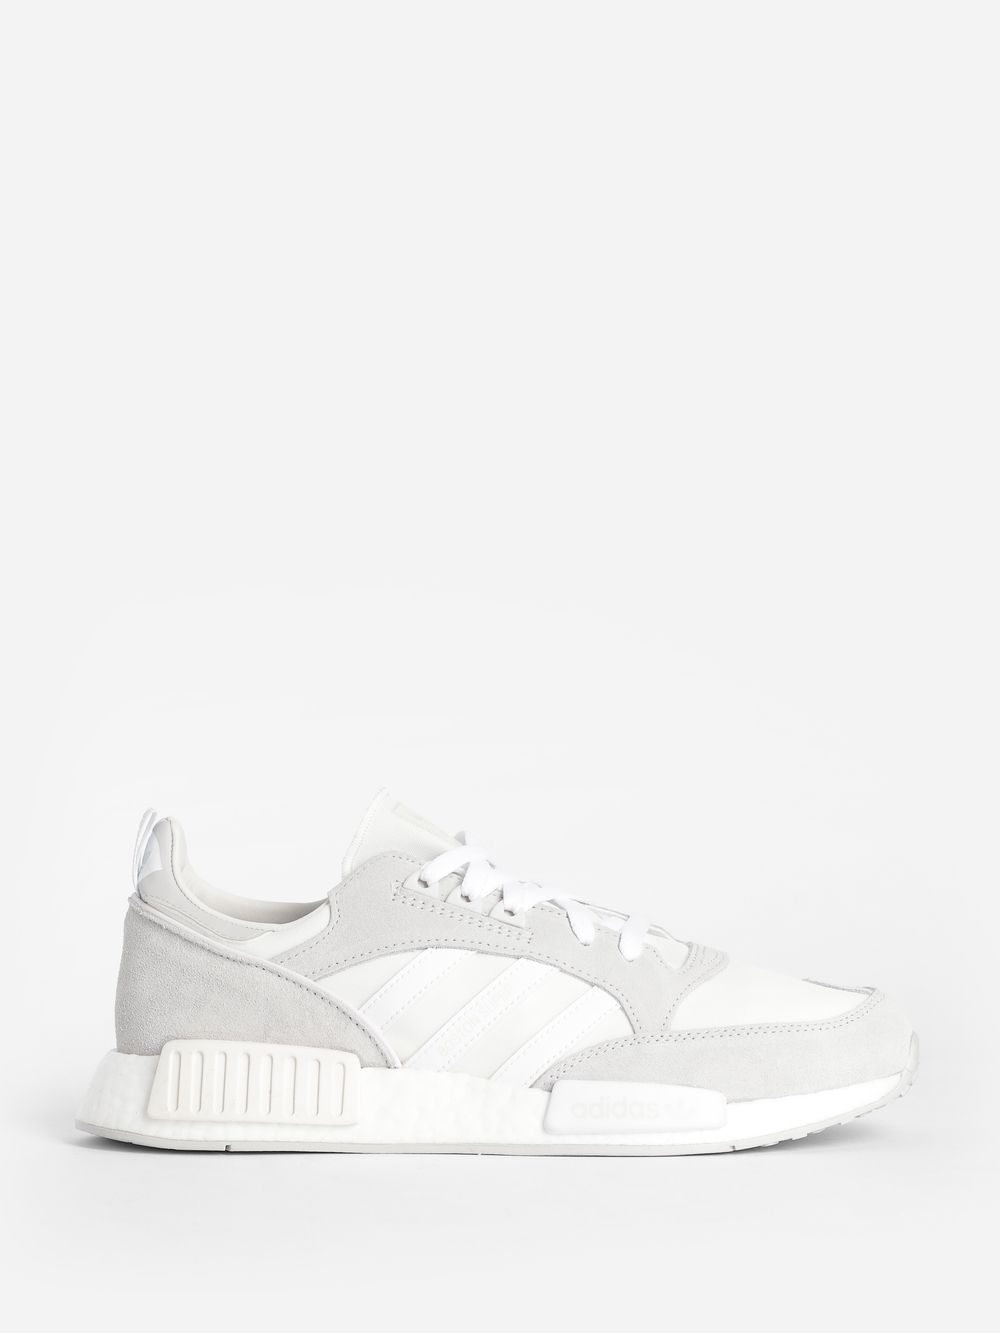 | adidas Boston SuperxR1 Shoes Men's | Fashion